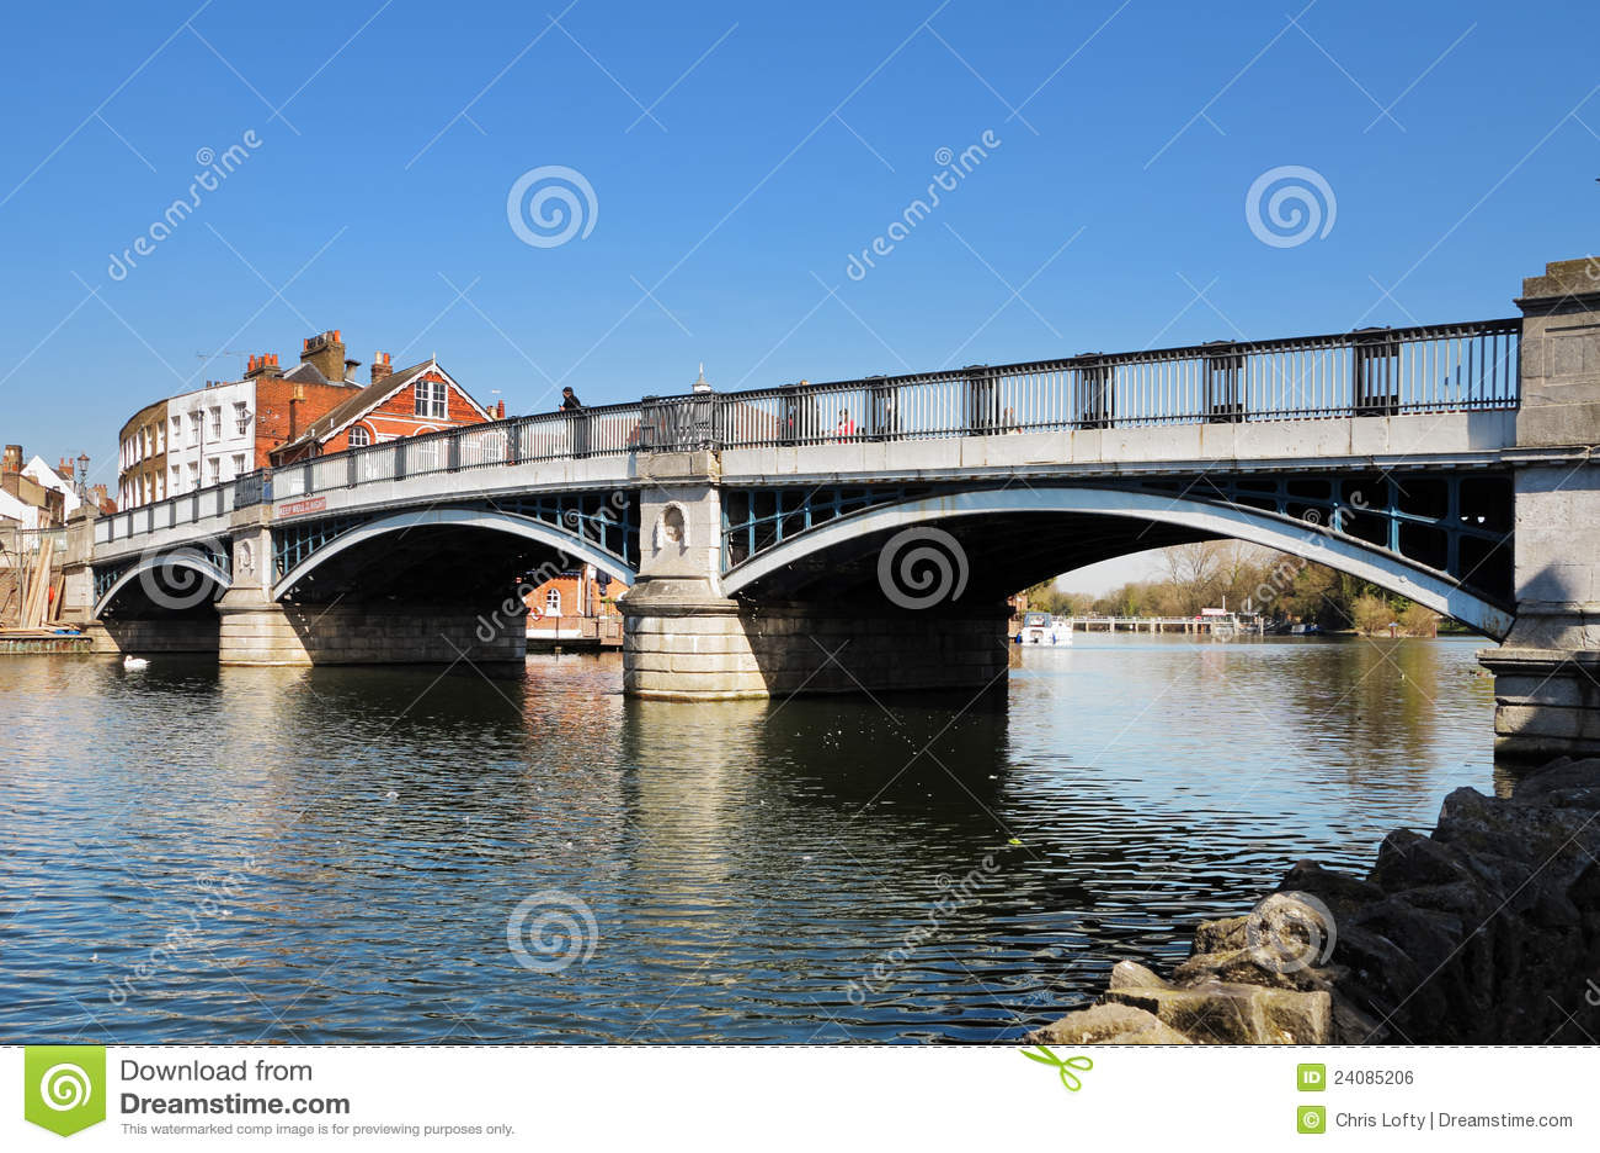 Windsor and Eton Bridge over the River Thames